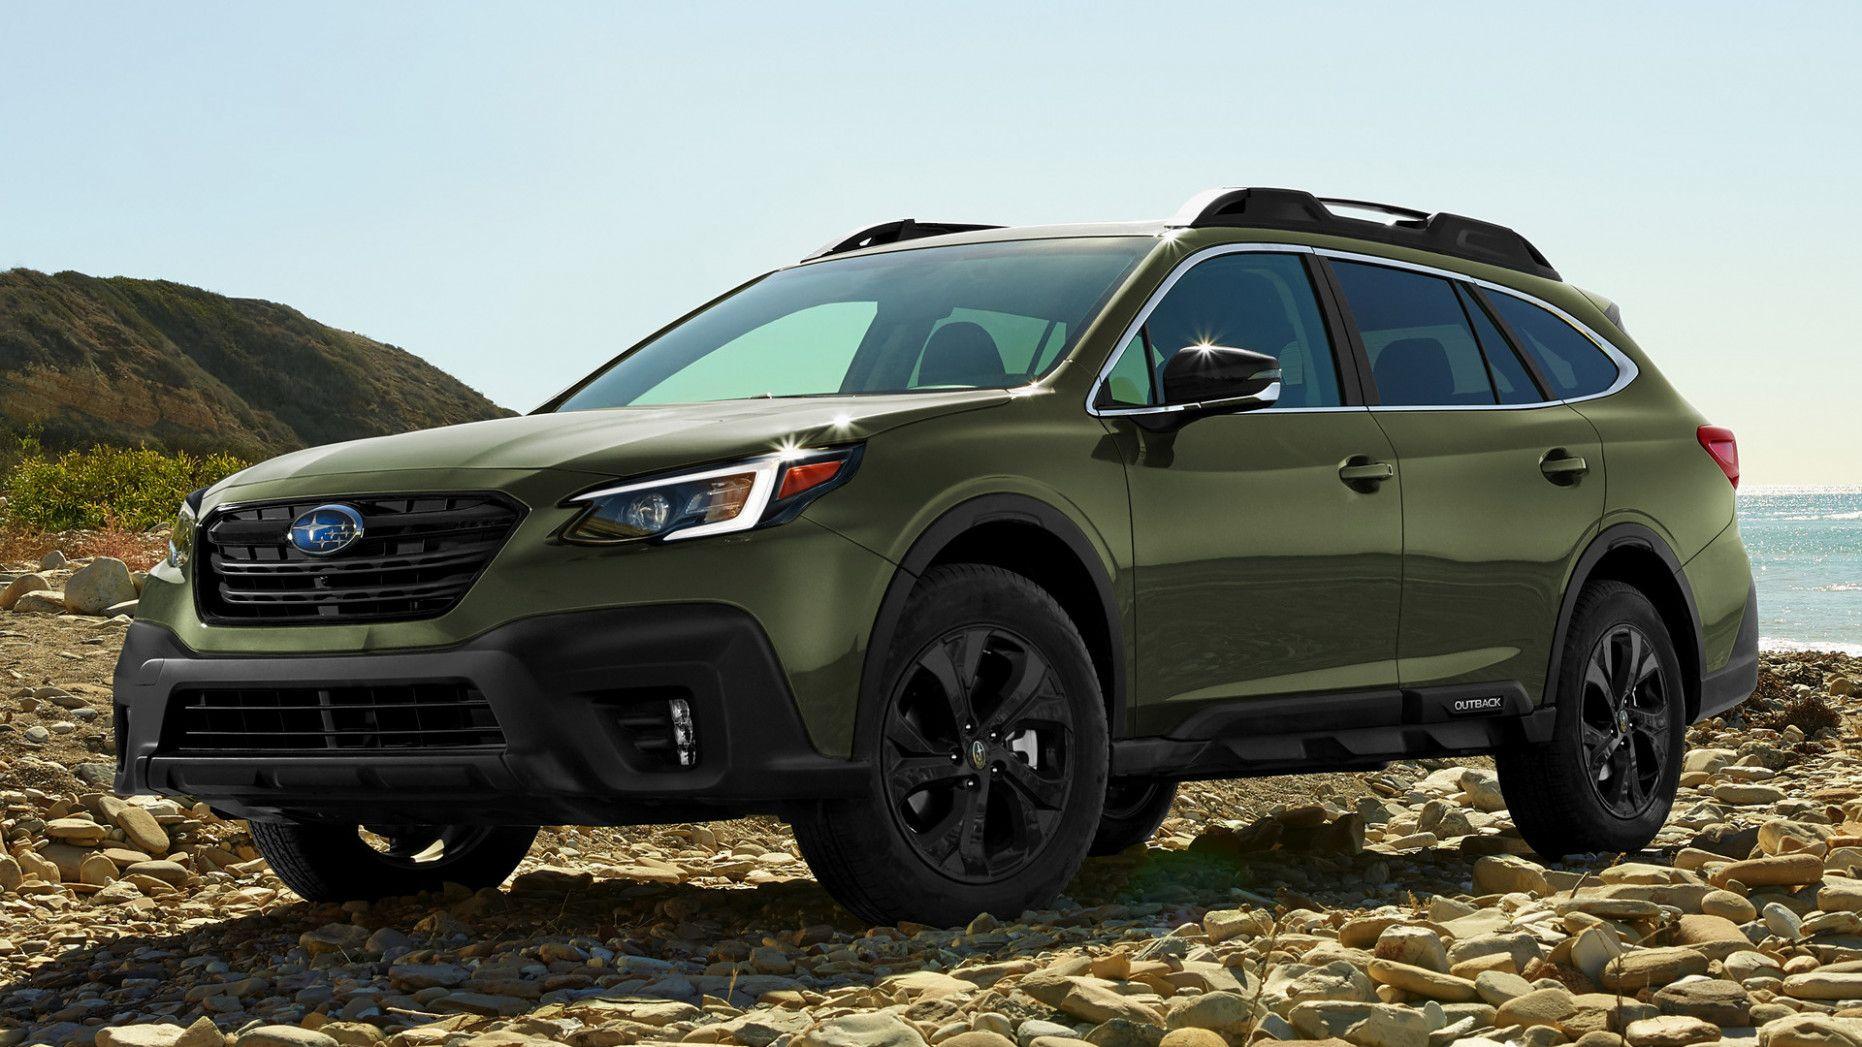 2020 Subaru Outback 3 6r In 2020 Subaru Outback Subaru Outback